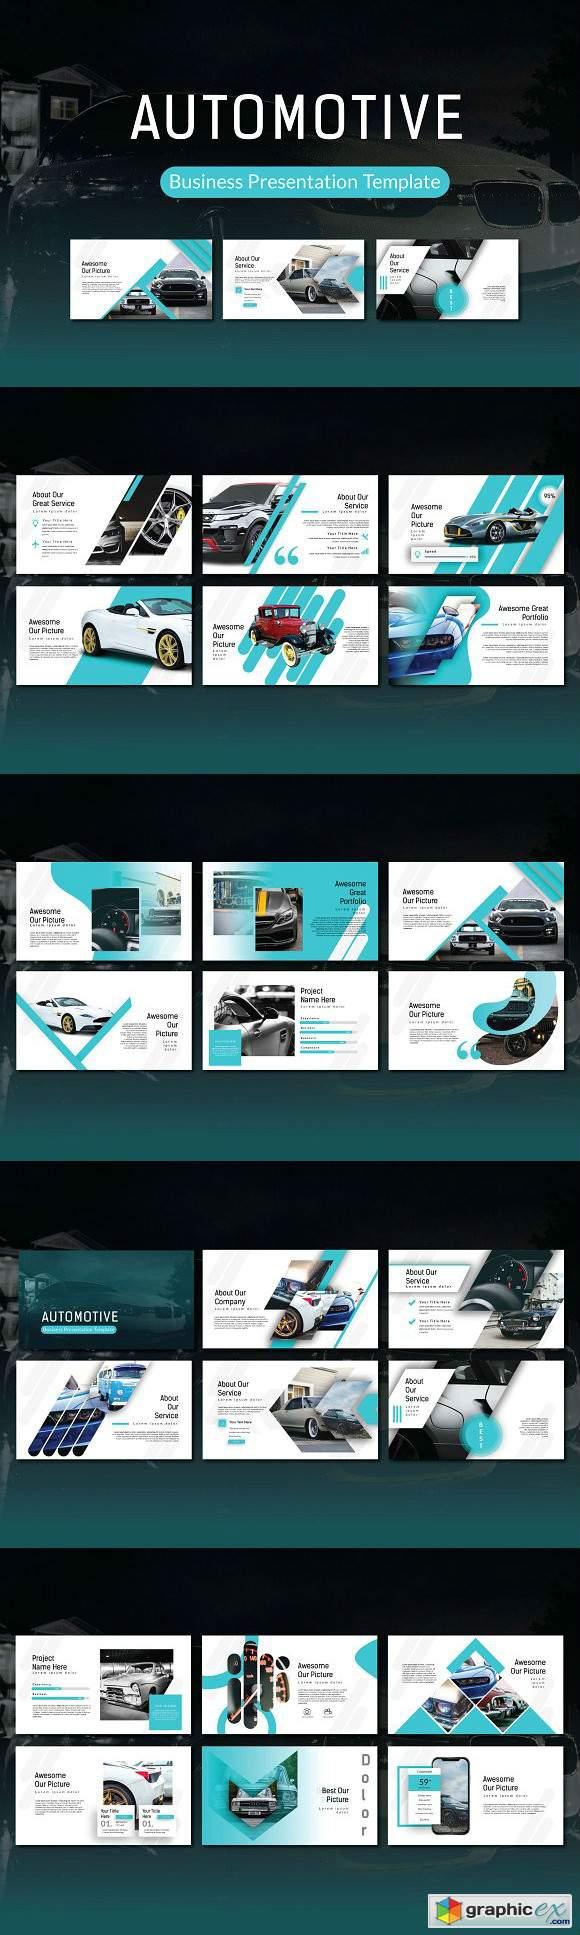 Indesign powerpoints free download vector stock image photoshop icon automotive powerpoint toneelgroepblik Image collections